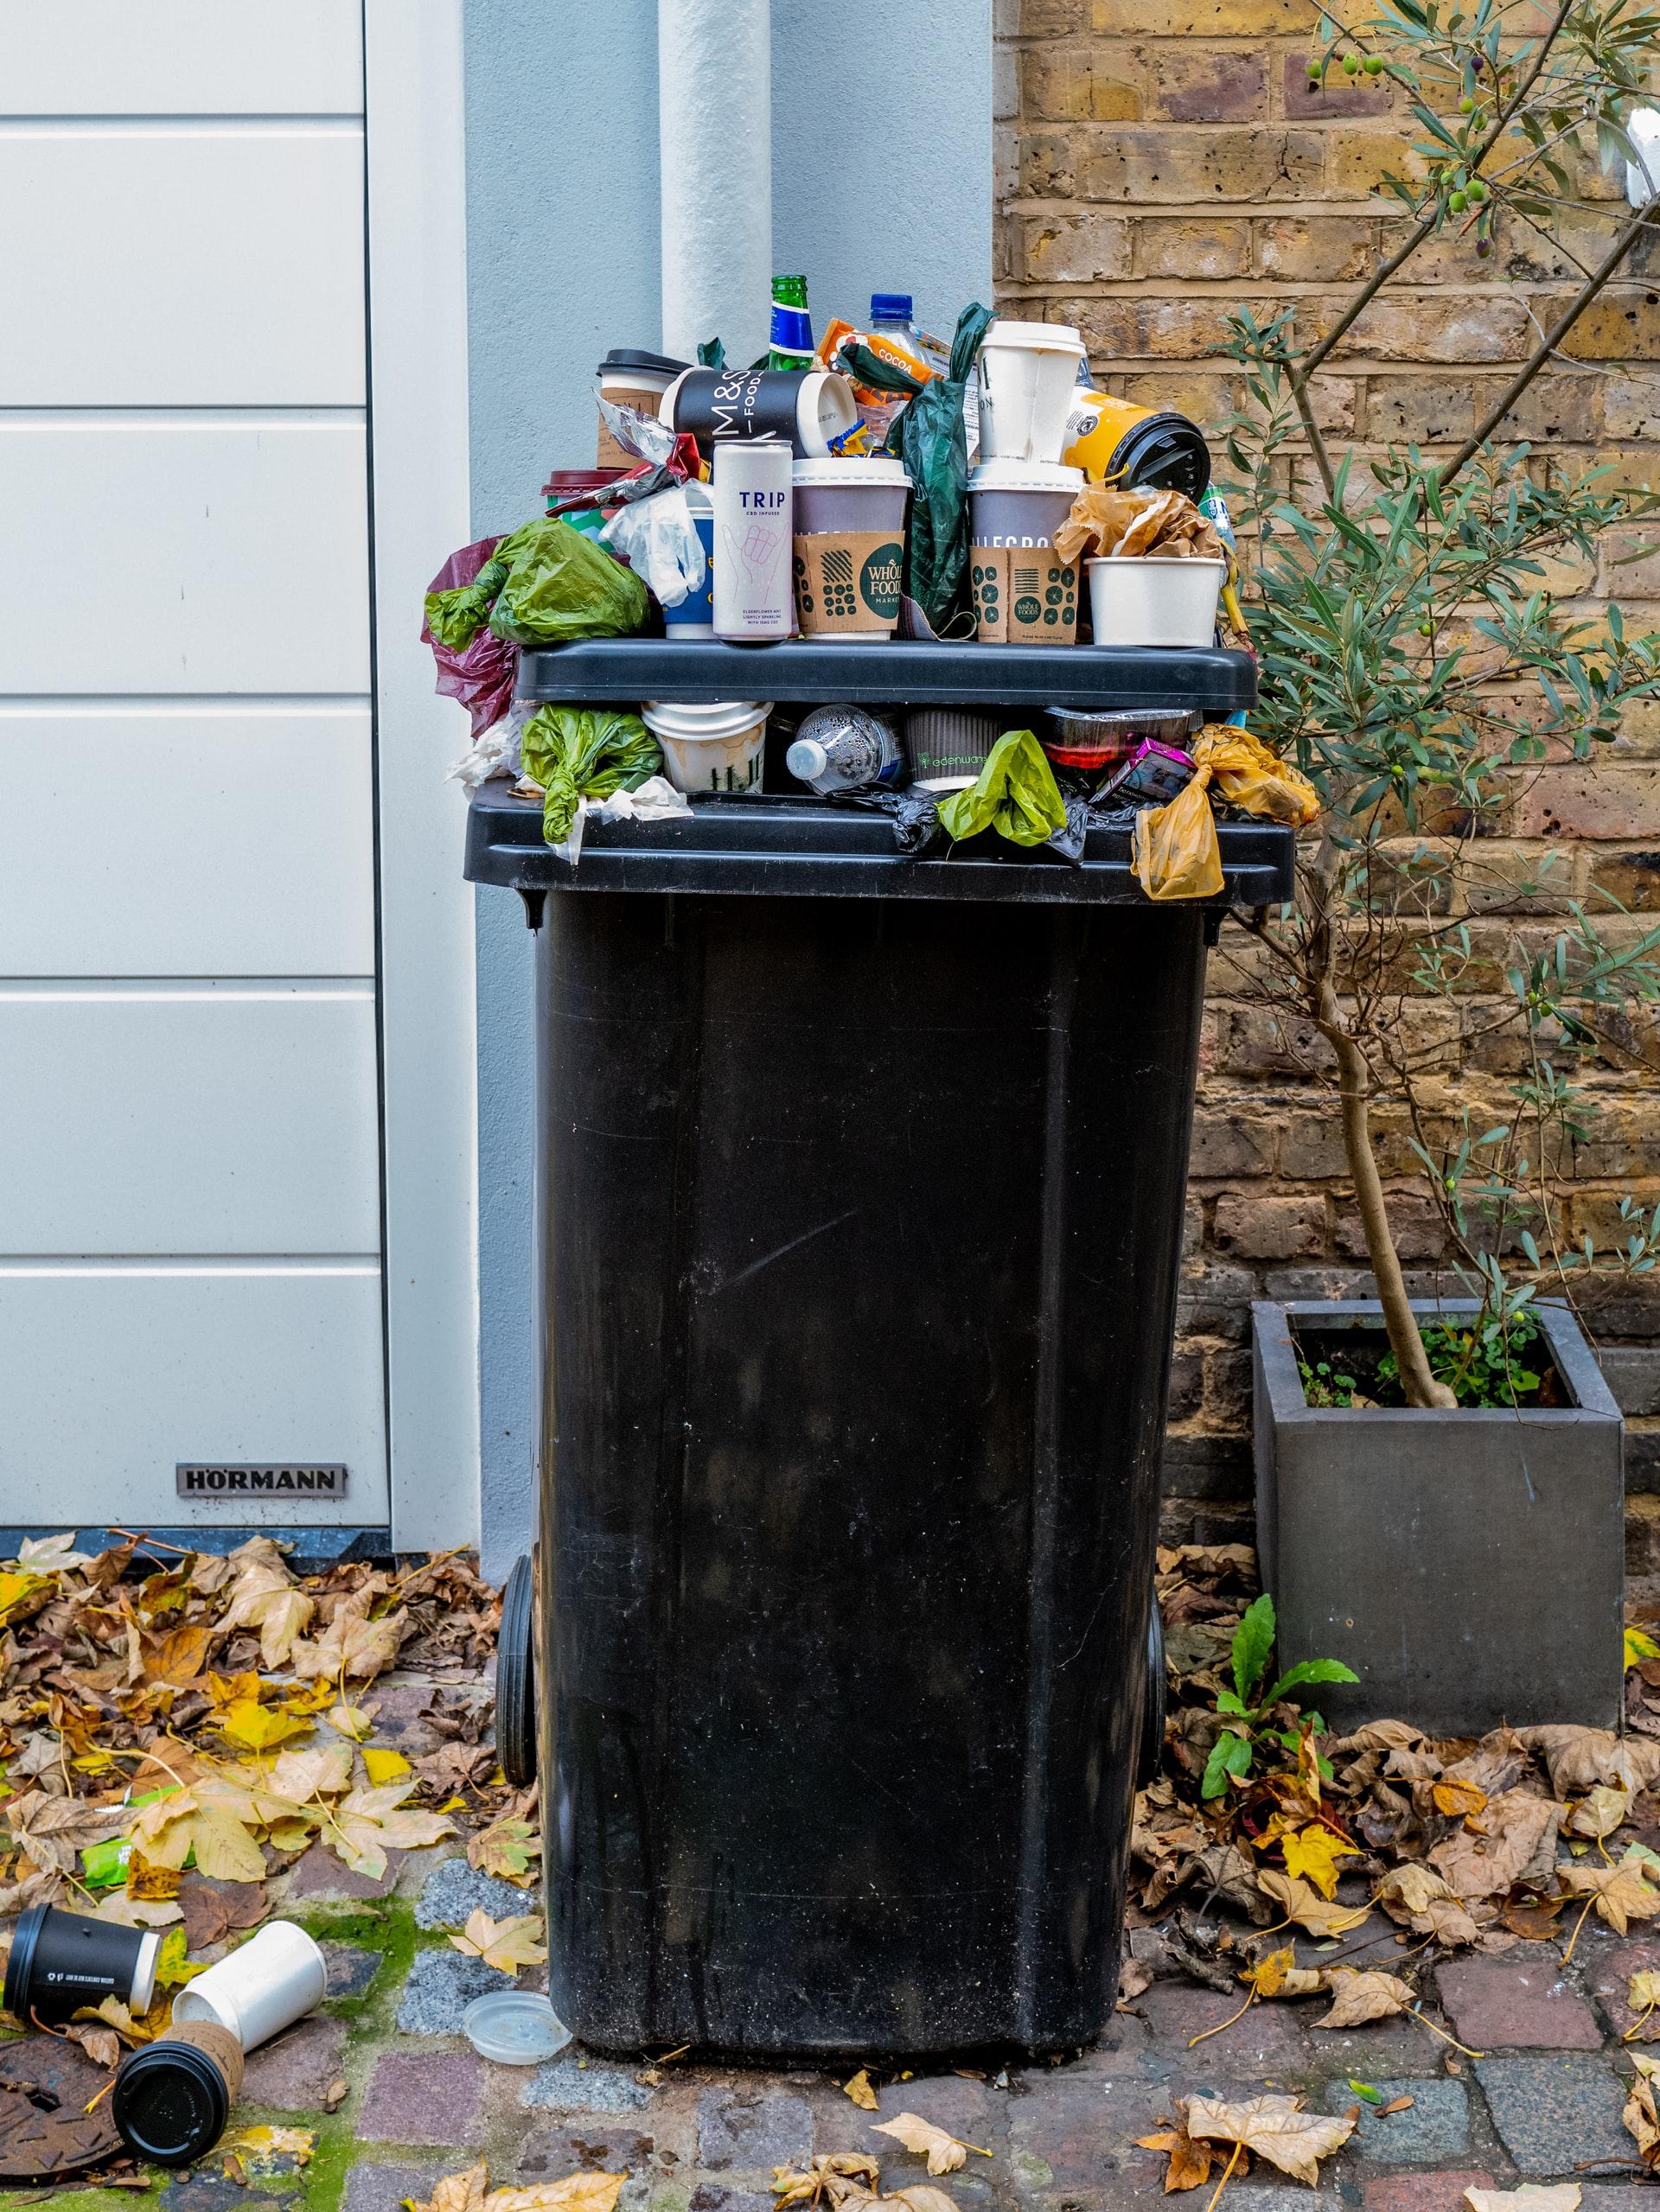 Blog post: Wat is de afvalhiërarchie?